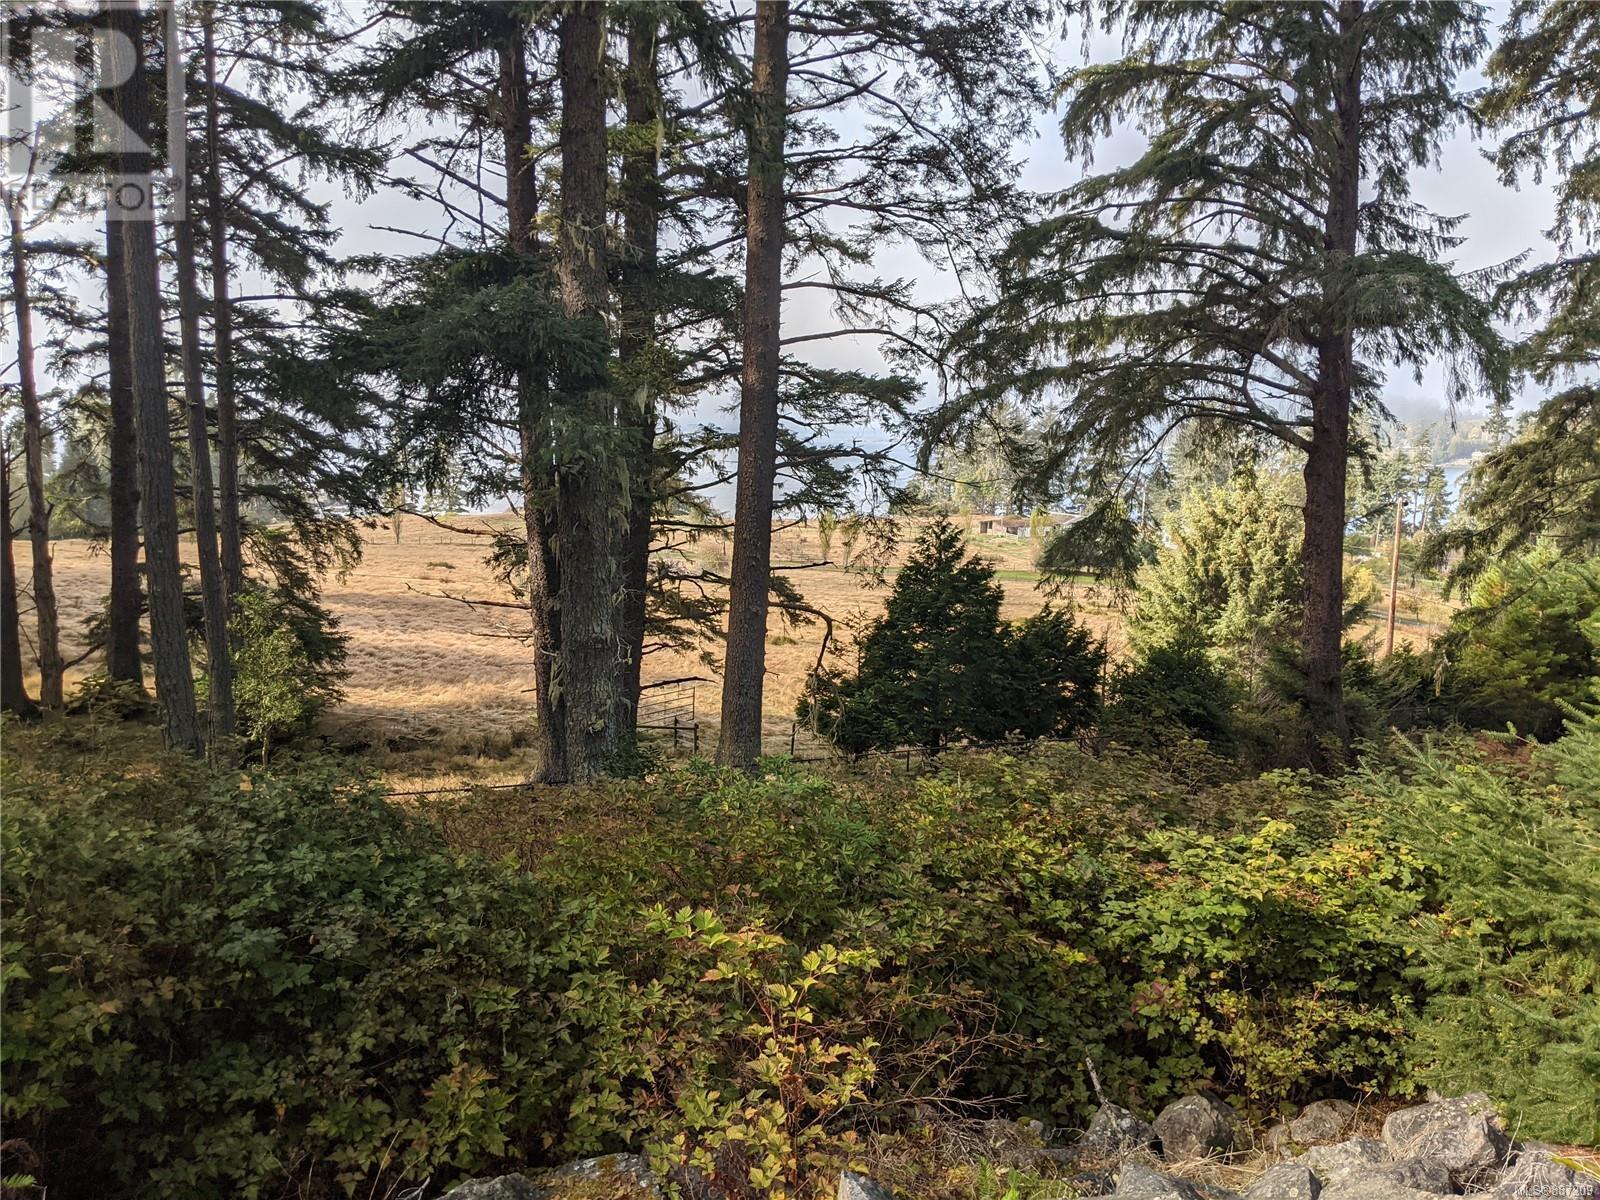 7200 East Sooke RdSooke, British Columbia  V9Z 1A8 - Photo 3 - 887209